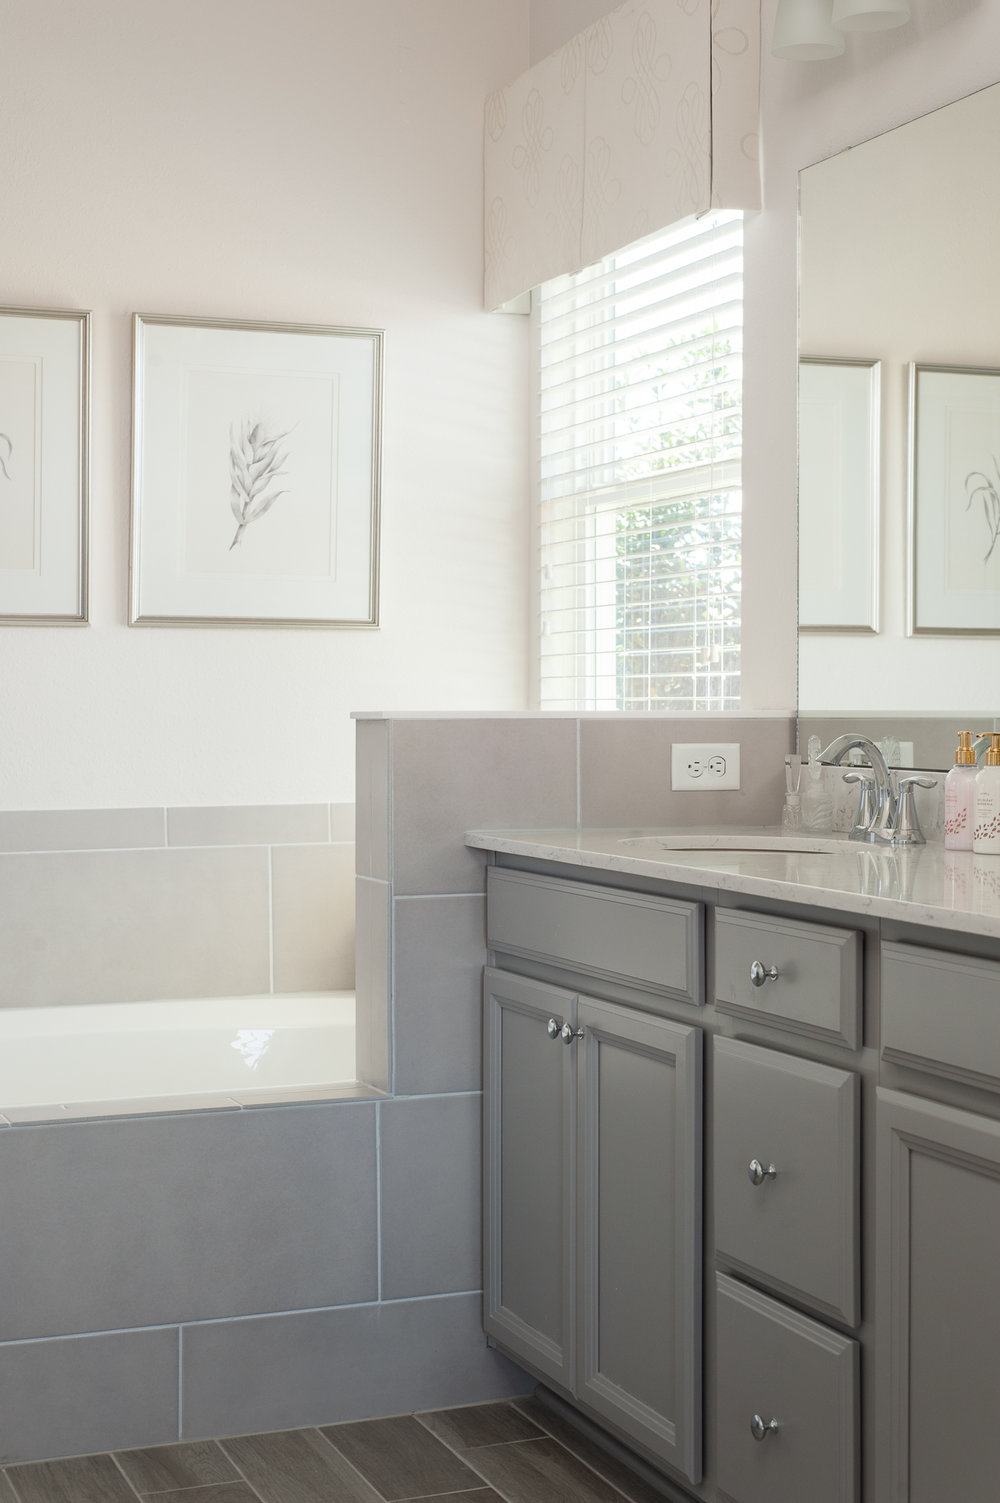 Micamy_Interior Designer_Design_Interior_Model_Merchandising_Owners_Suite_Universal_Furniture_Traditional_Transitional_Bathroom_Vanity_Grey_Cabinets.jpg